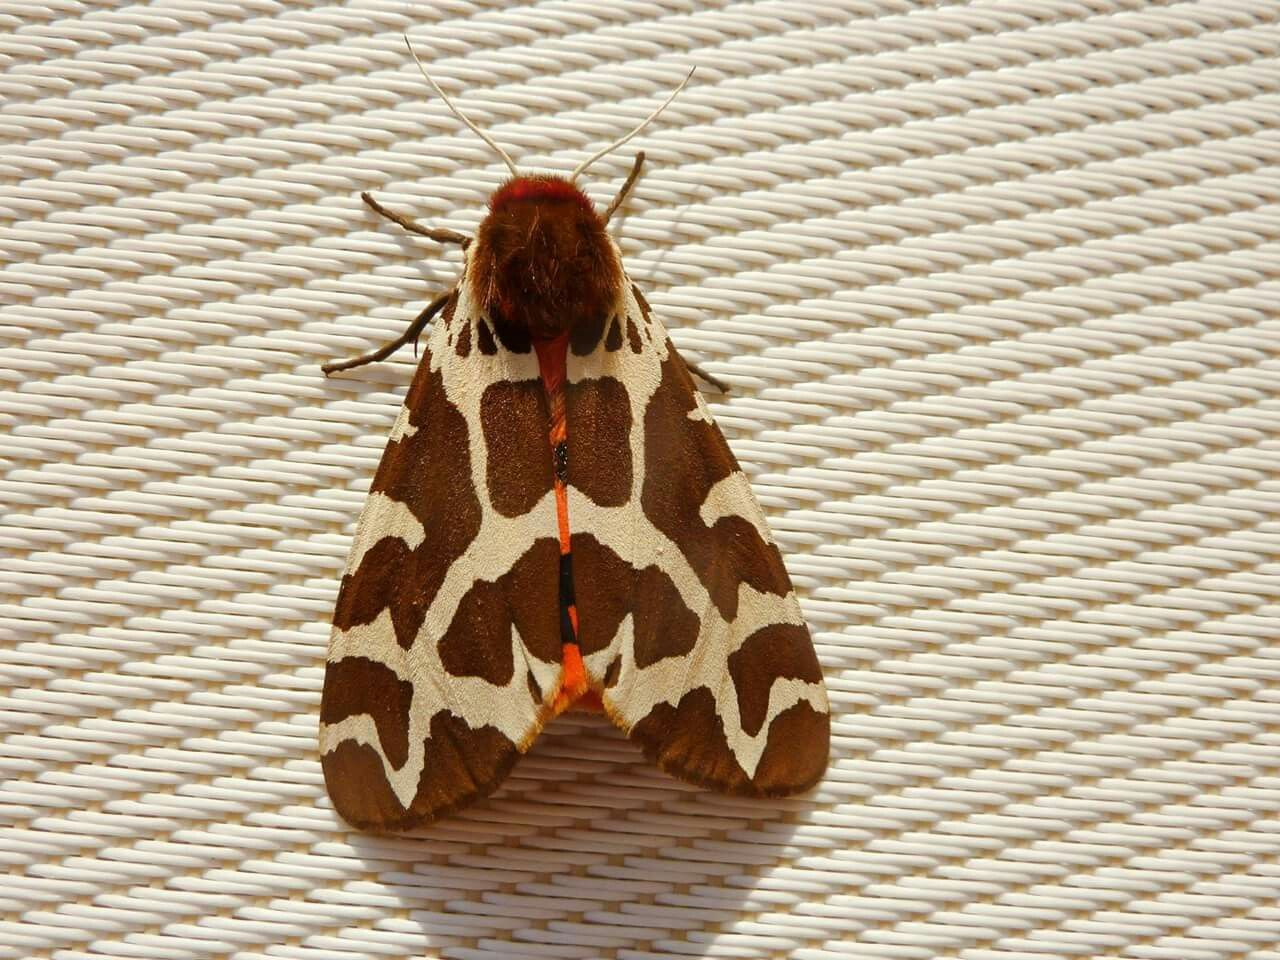 Garden Tiger Moth - Arctia caja   Insect- Moths   Pinterest   Moth ...